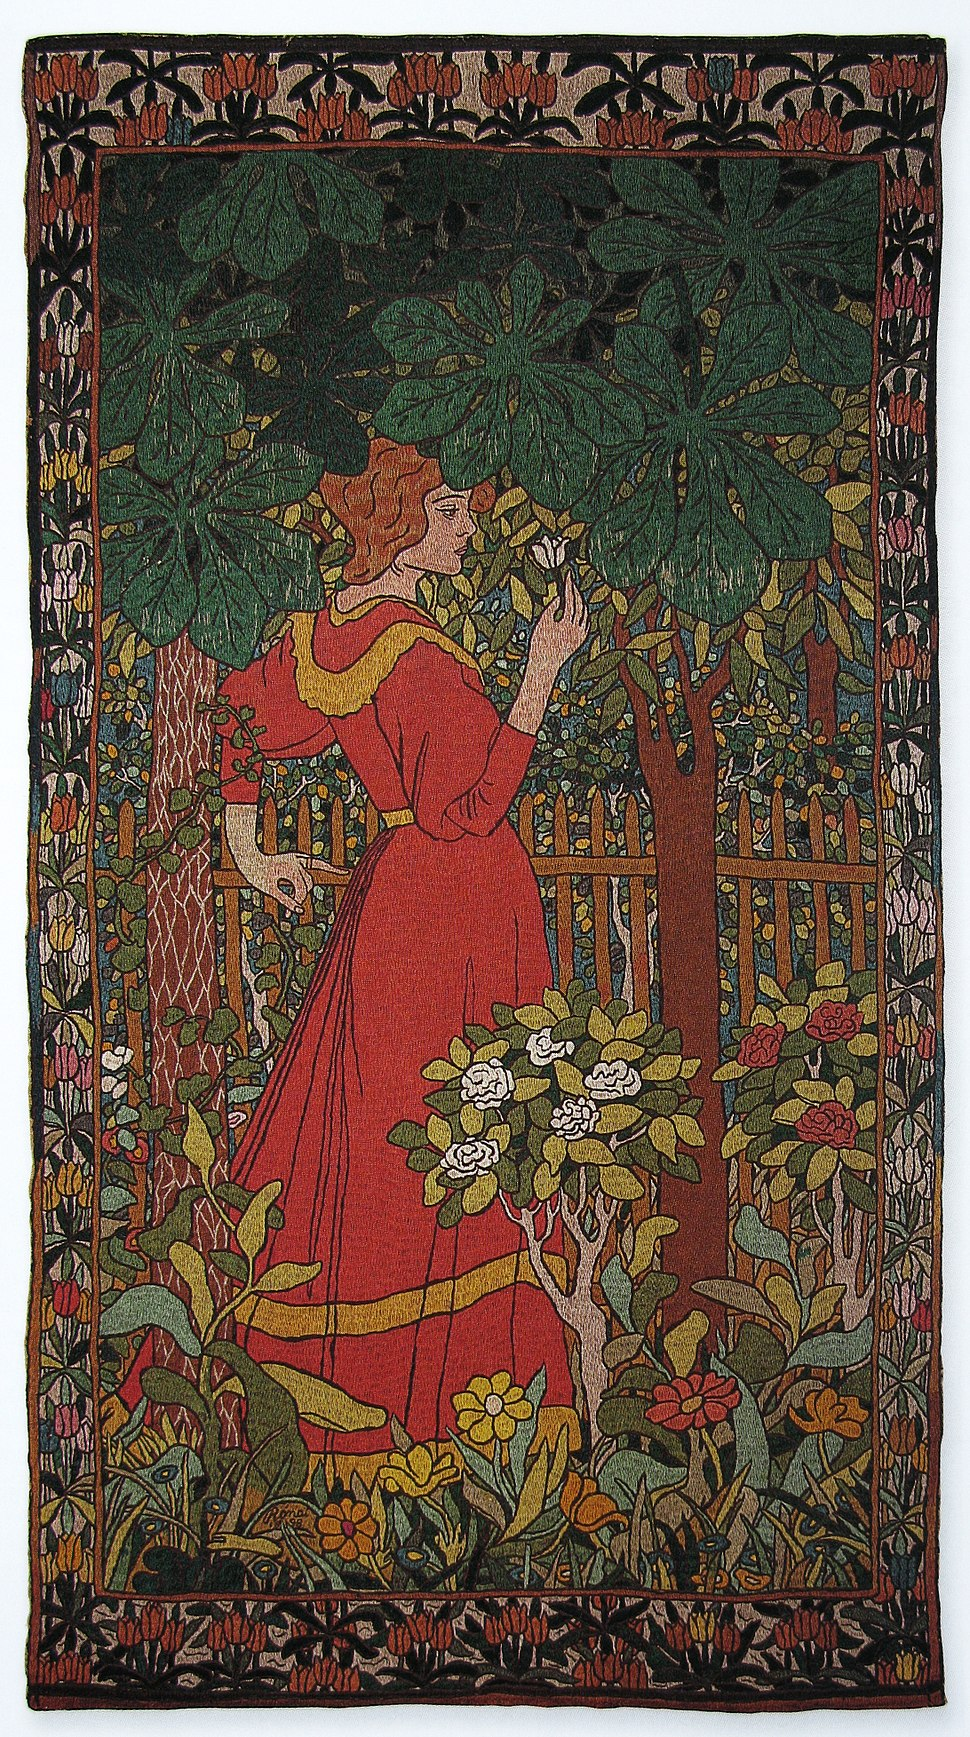 DameEnRobeRouge Rippl-Ronai 1898